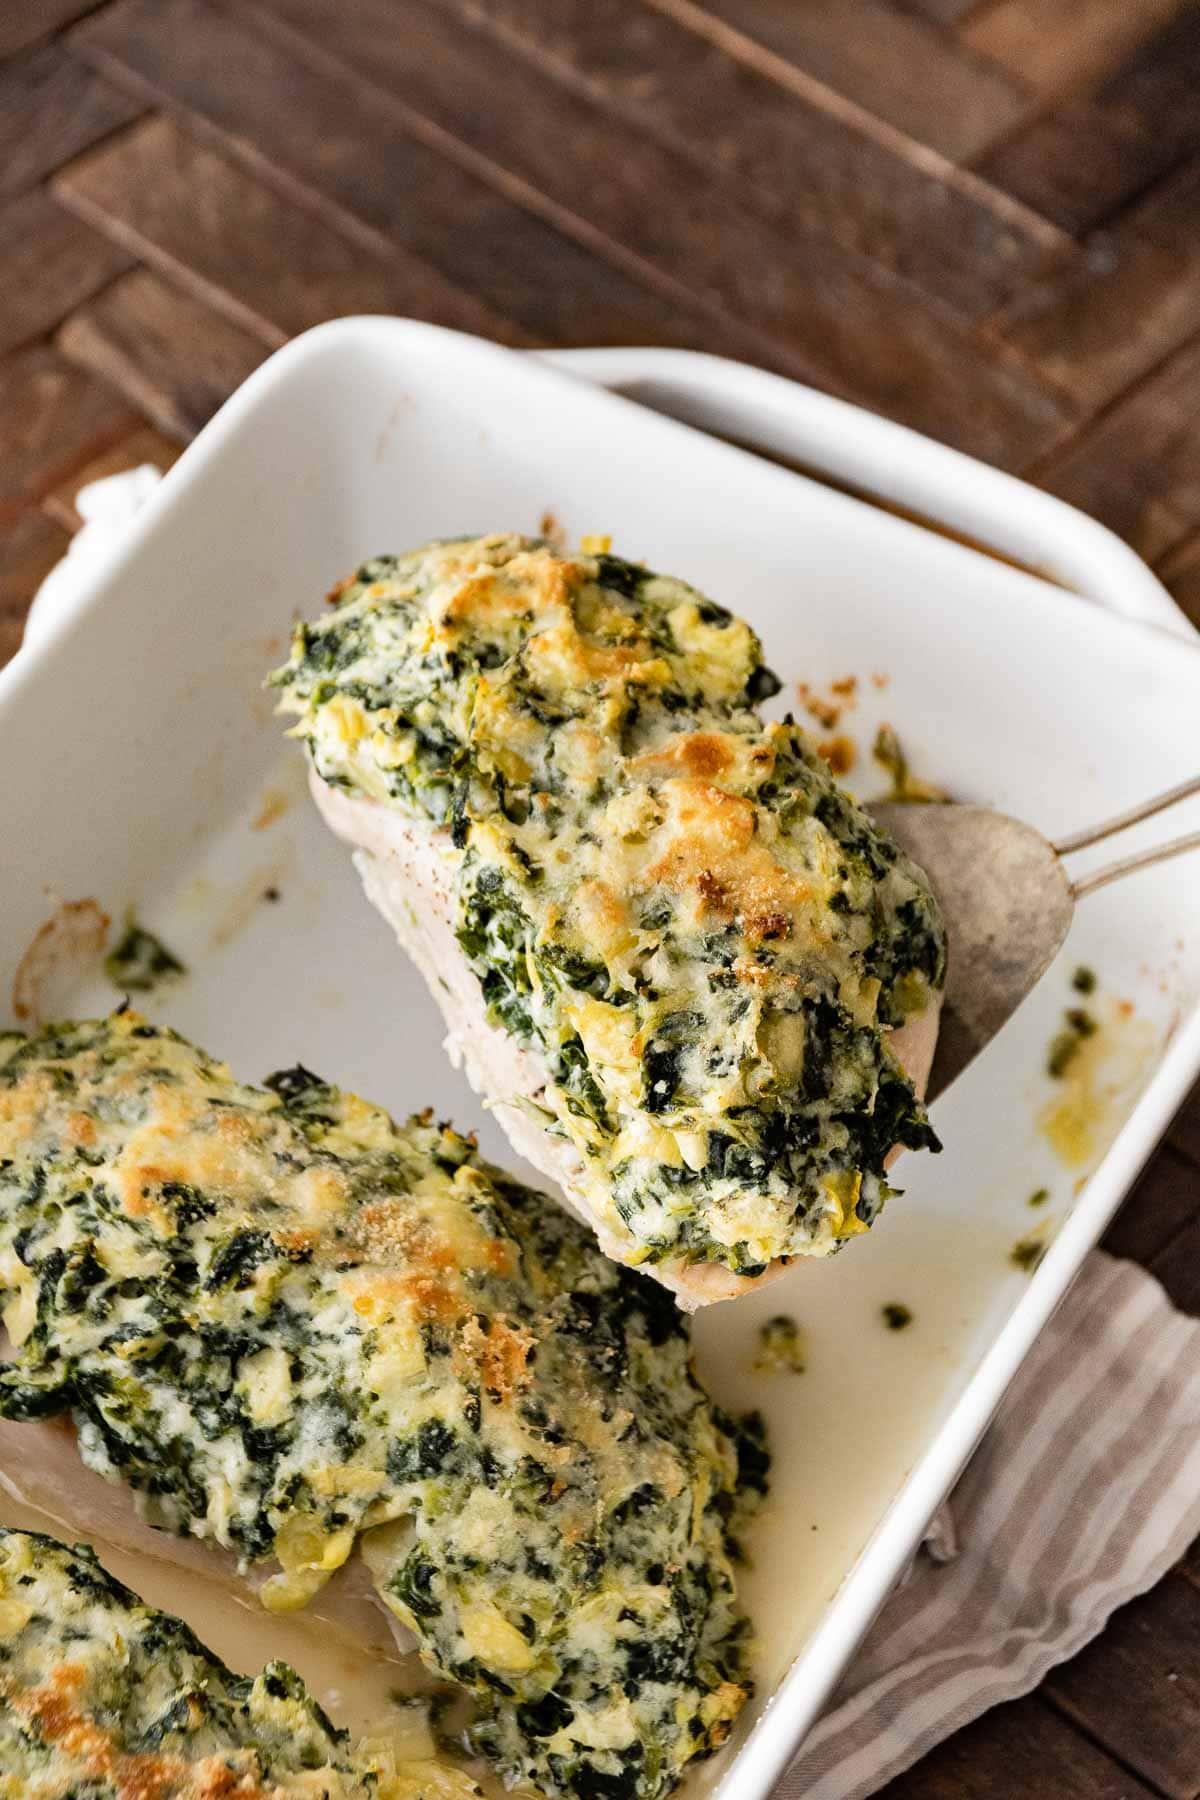 Baked Spinach Artichoke Chicken in baking dish